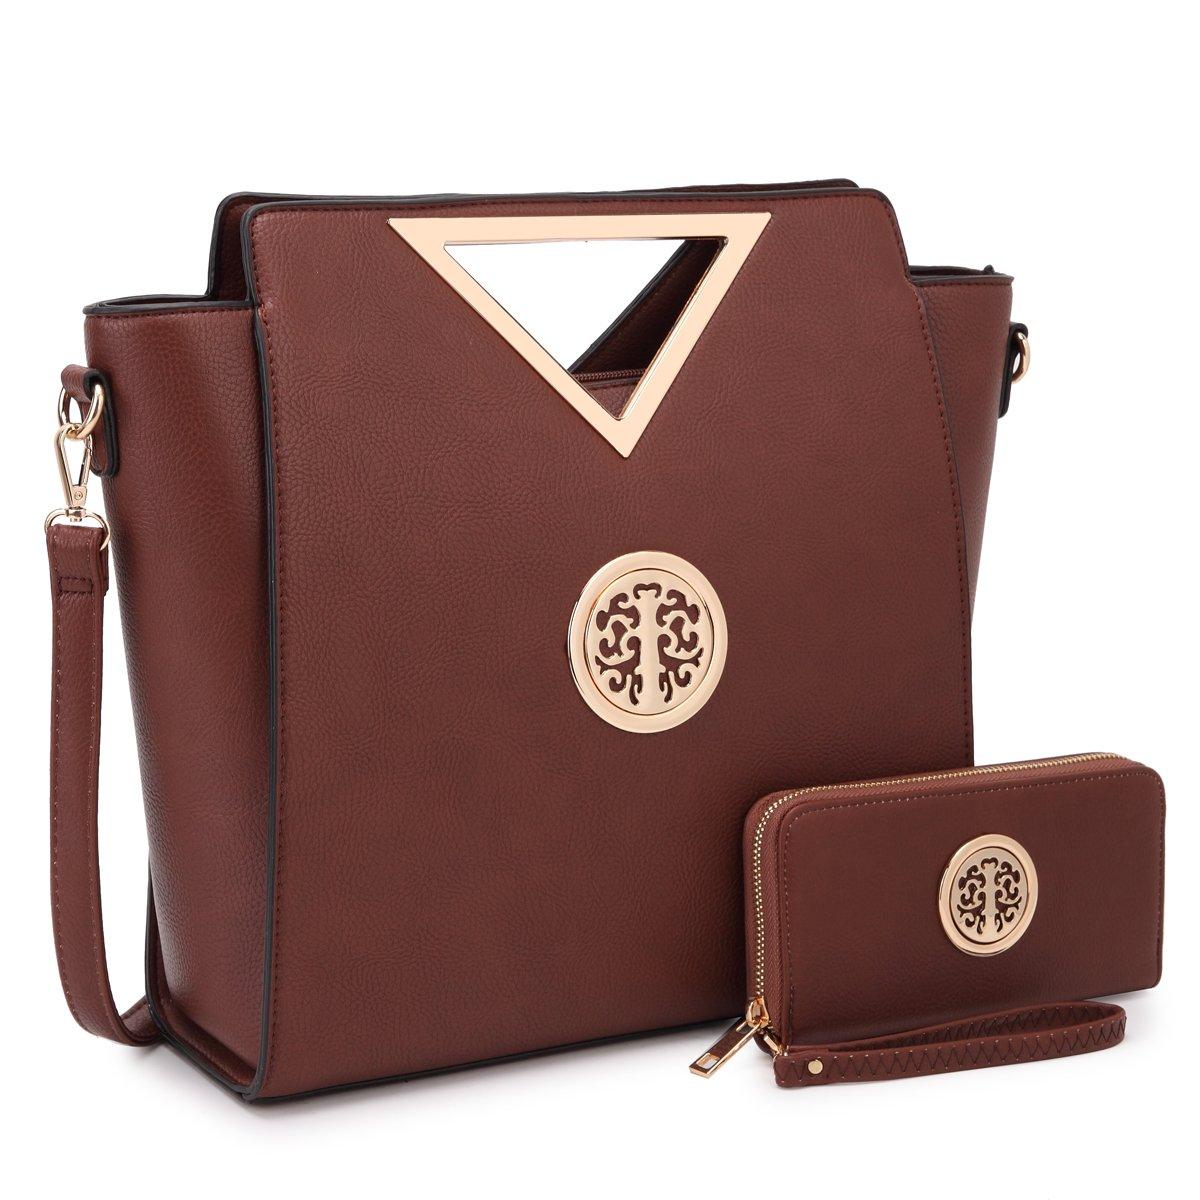 Dasein Winged Tote B0714BZ59G 7464 Brown + Matching Wallet 7464 Brown + Matching Wallet